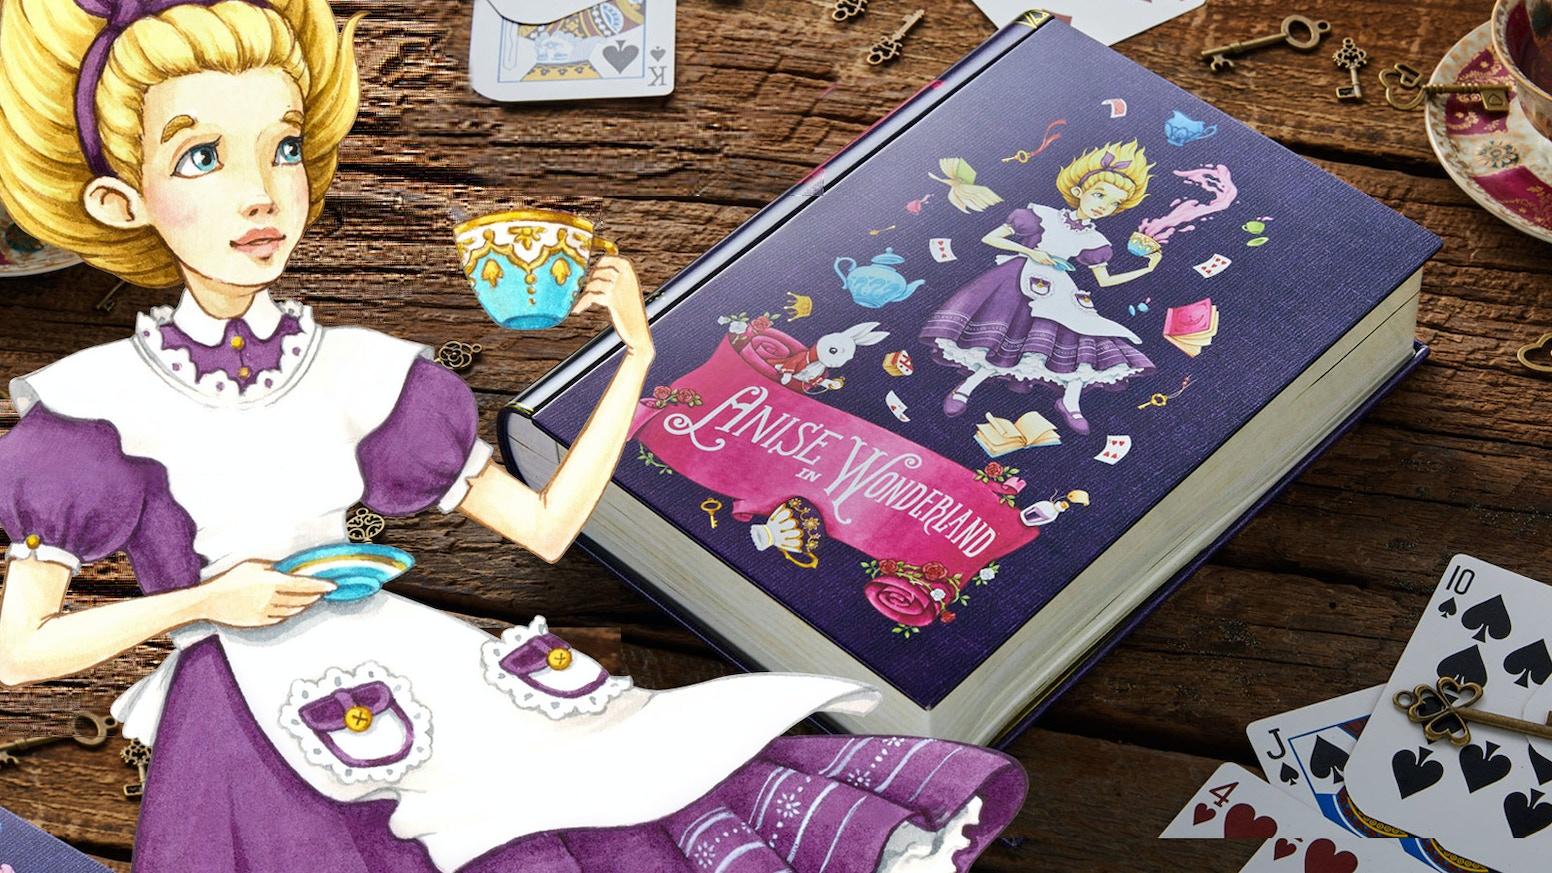 NovelTea Tins are Back! ~ Anise in Wonderland, Pu'er Rabbit and many more -- Punny Tea Caddies For Avid Book Readers